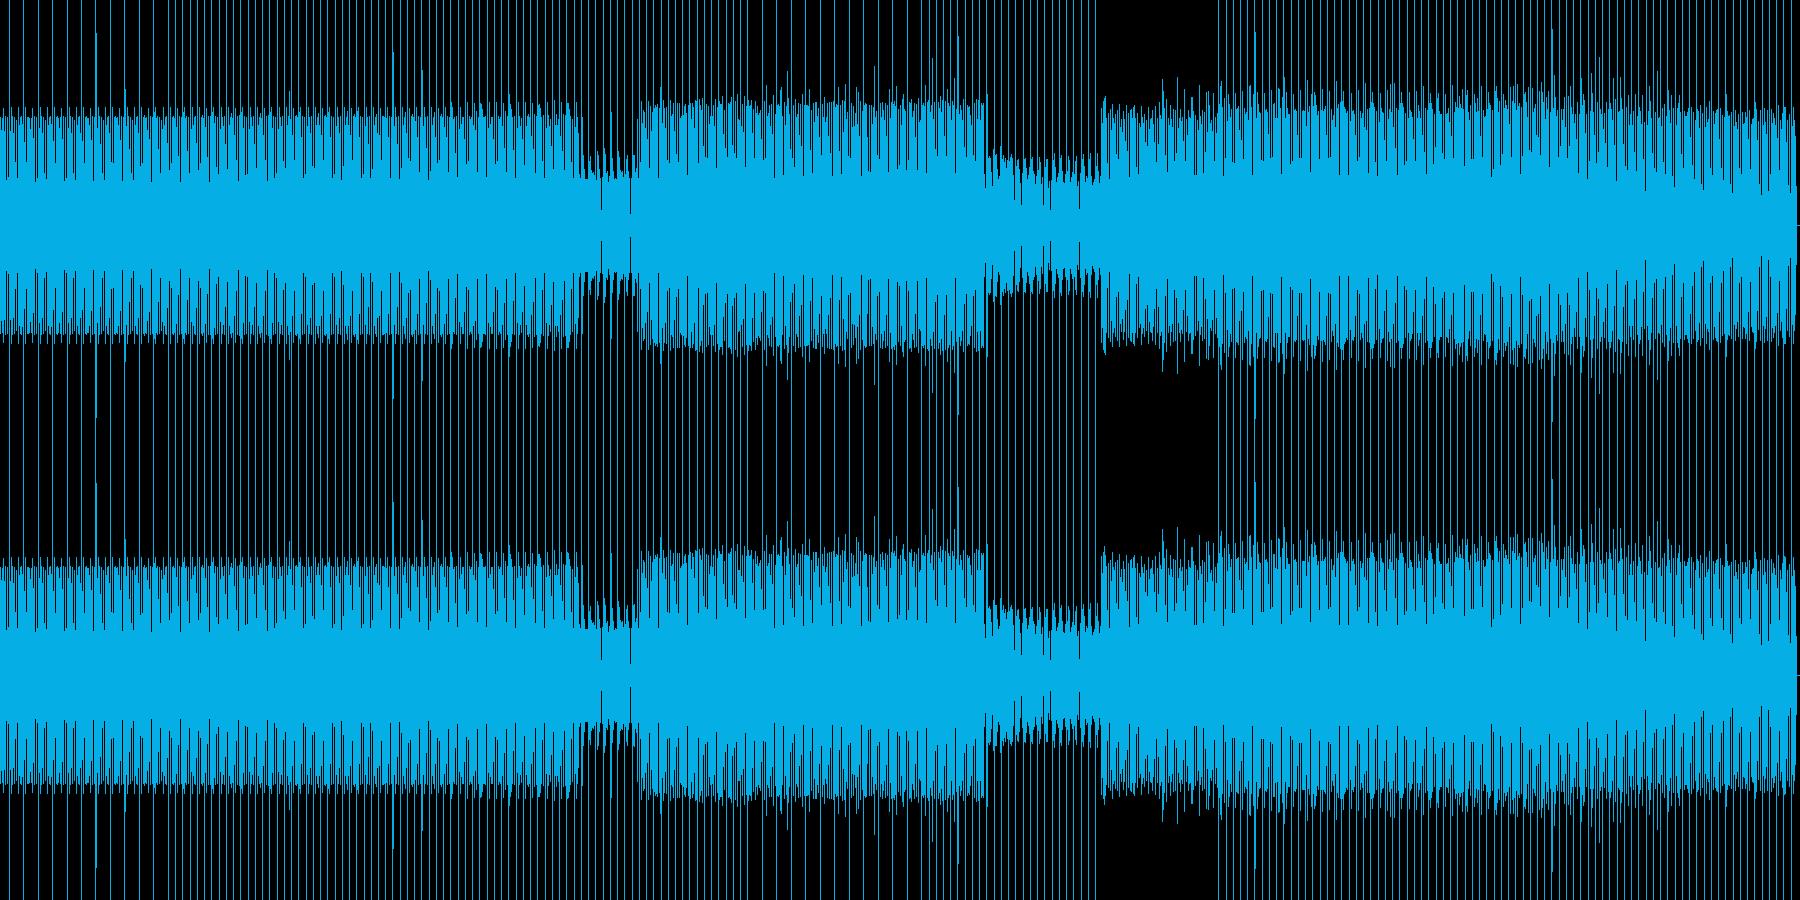 minimal house 02 の再生済みの波形